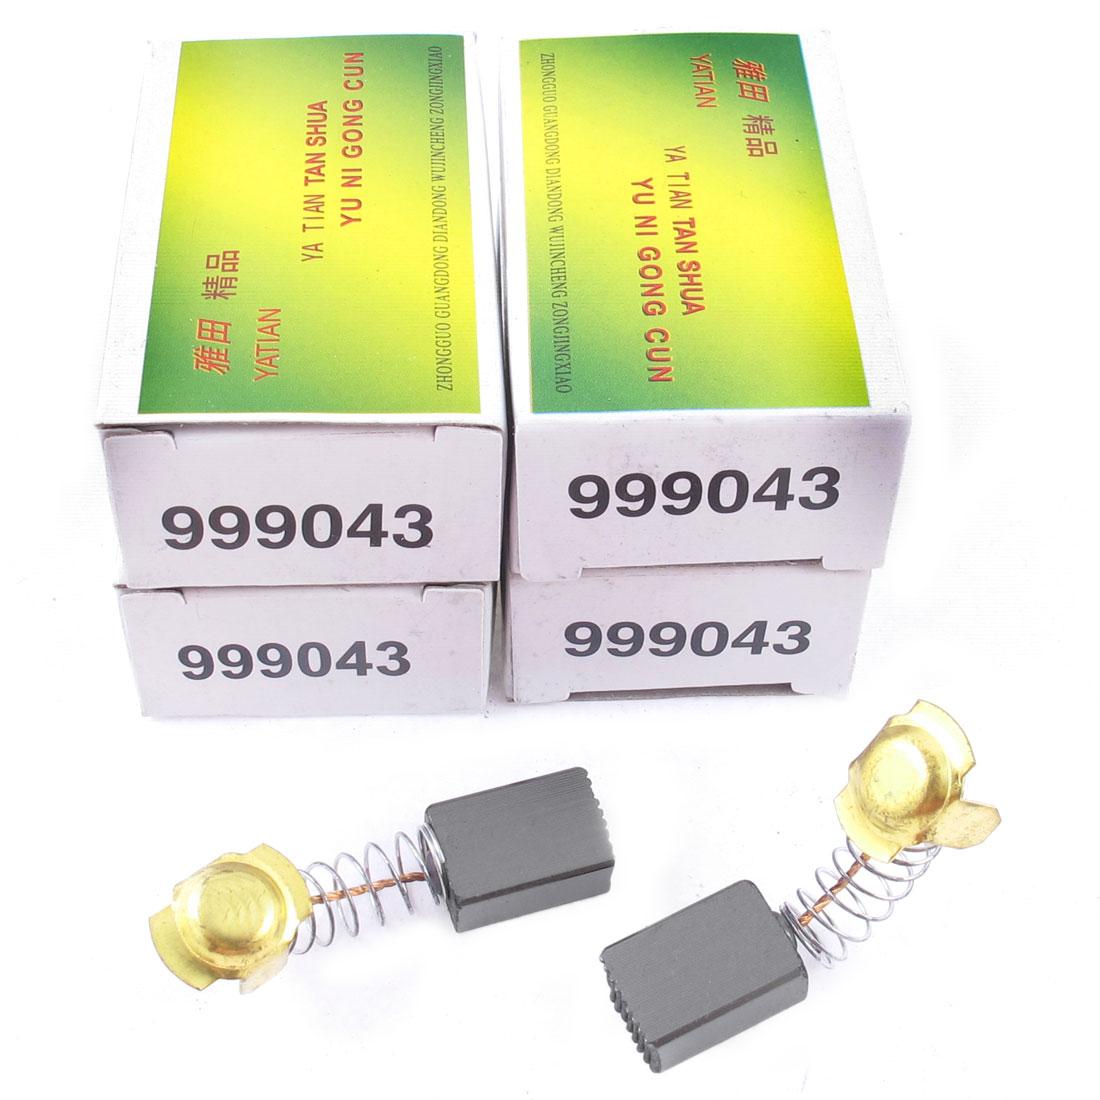 10 Pcs Electric Motor Carbon Brush 7 x 11 x 16mm for Hitachi 999043